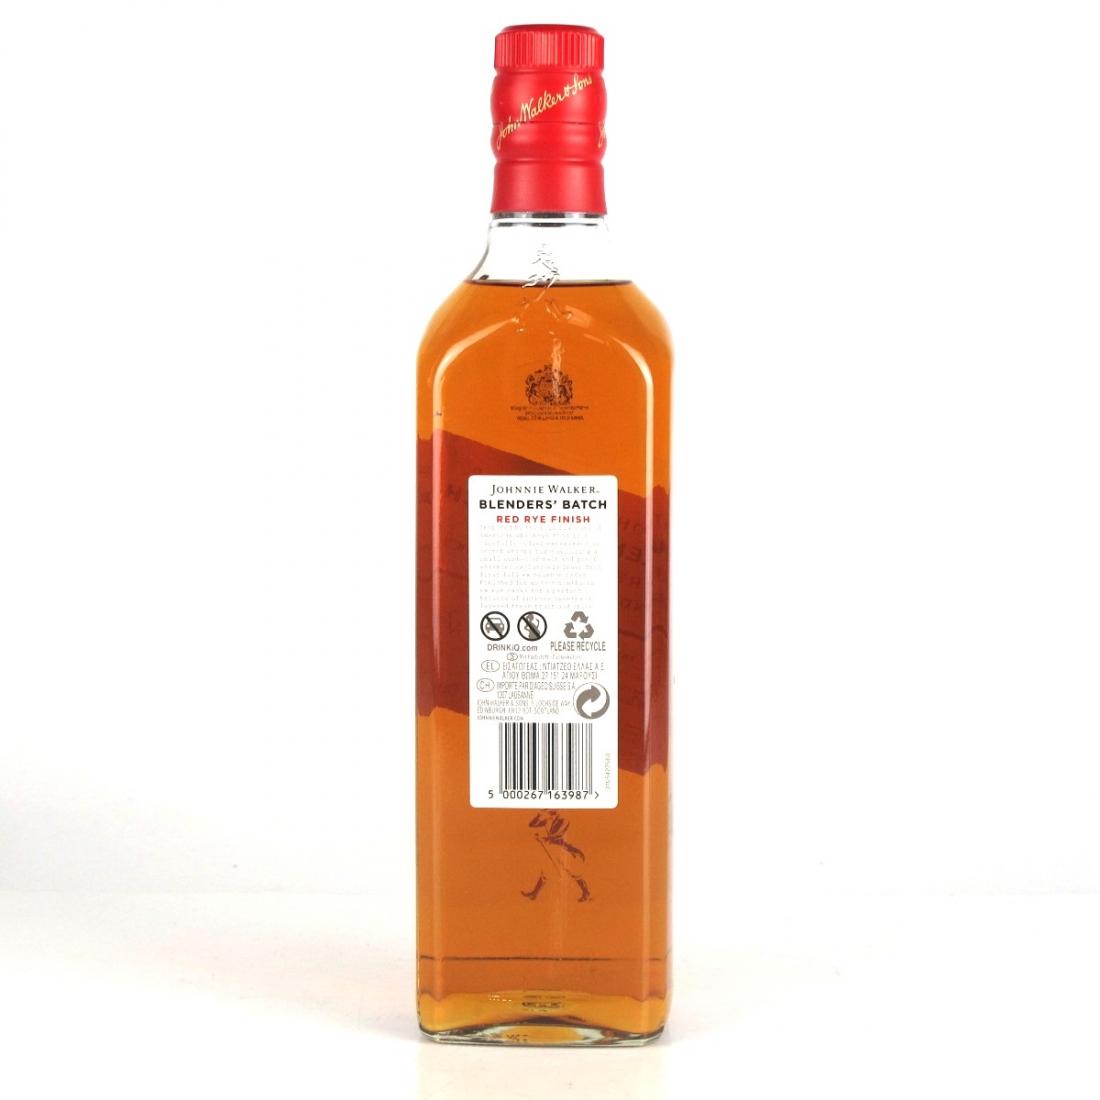 Johnnie Walker Blenders' Batch Red Rye Finish Batch #1